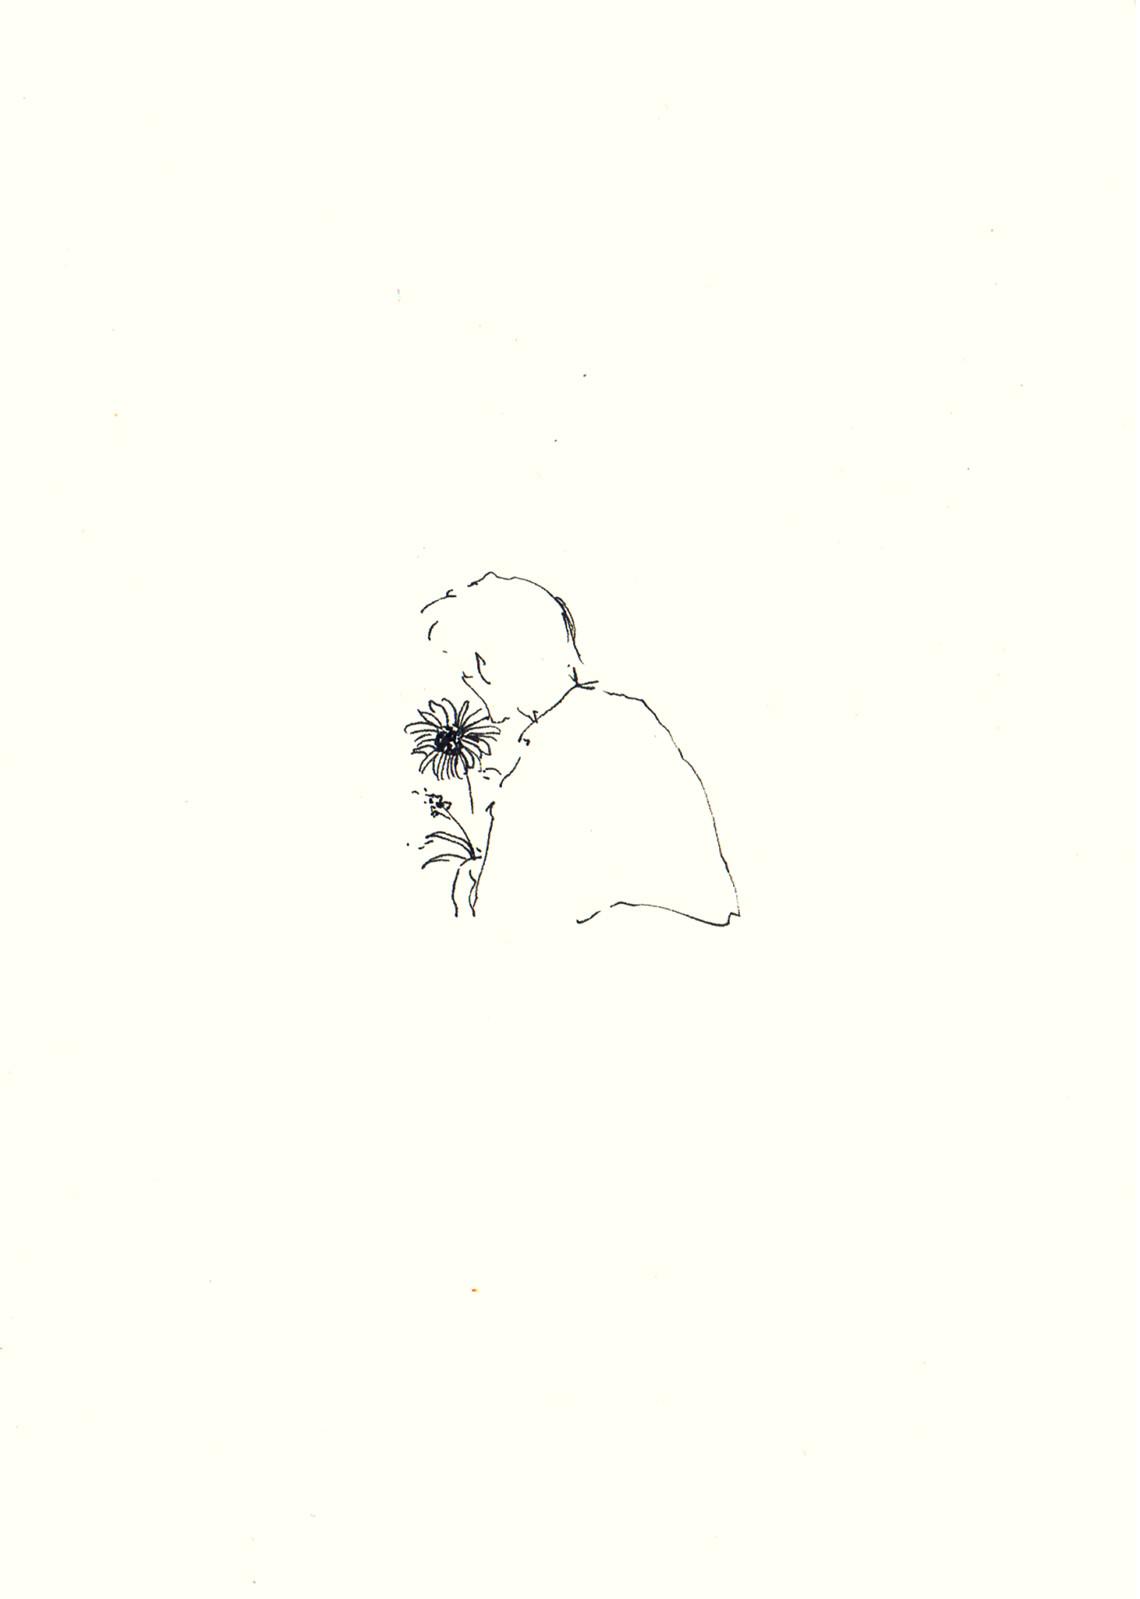 untitled sunflower 2016 pen